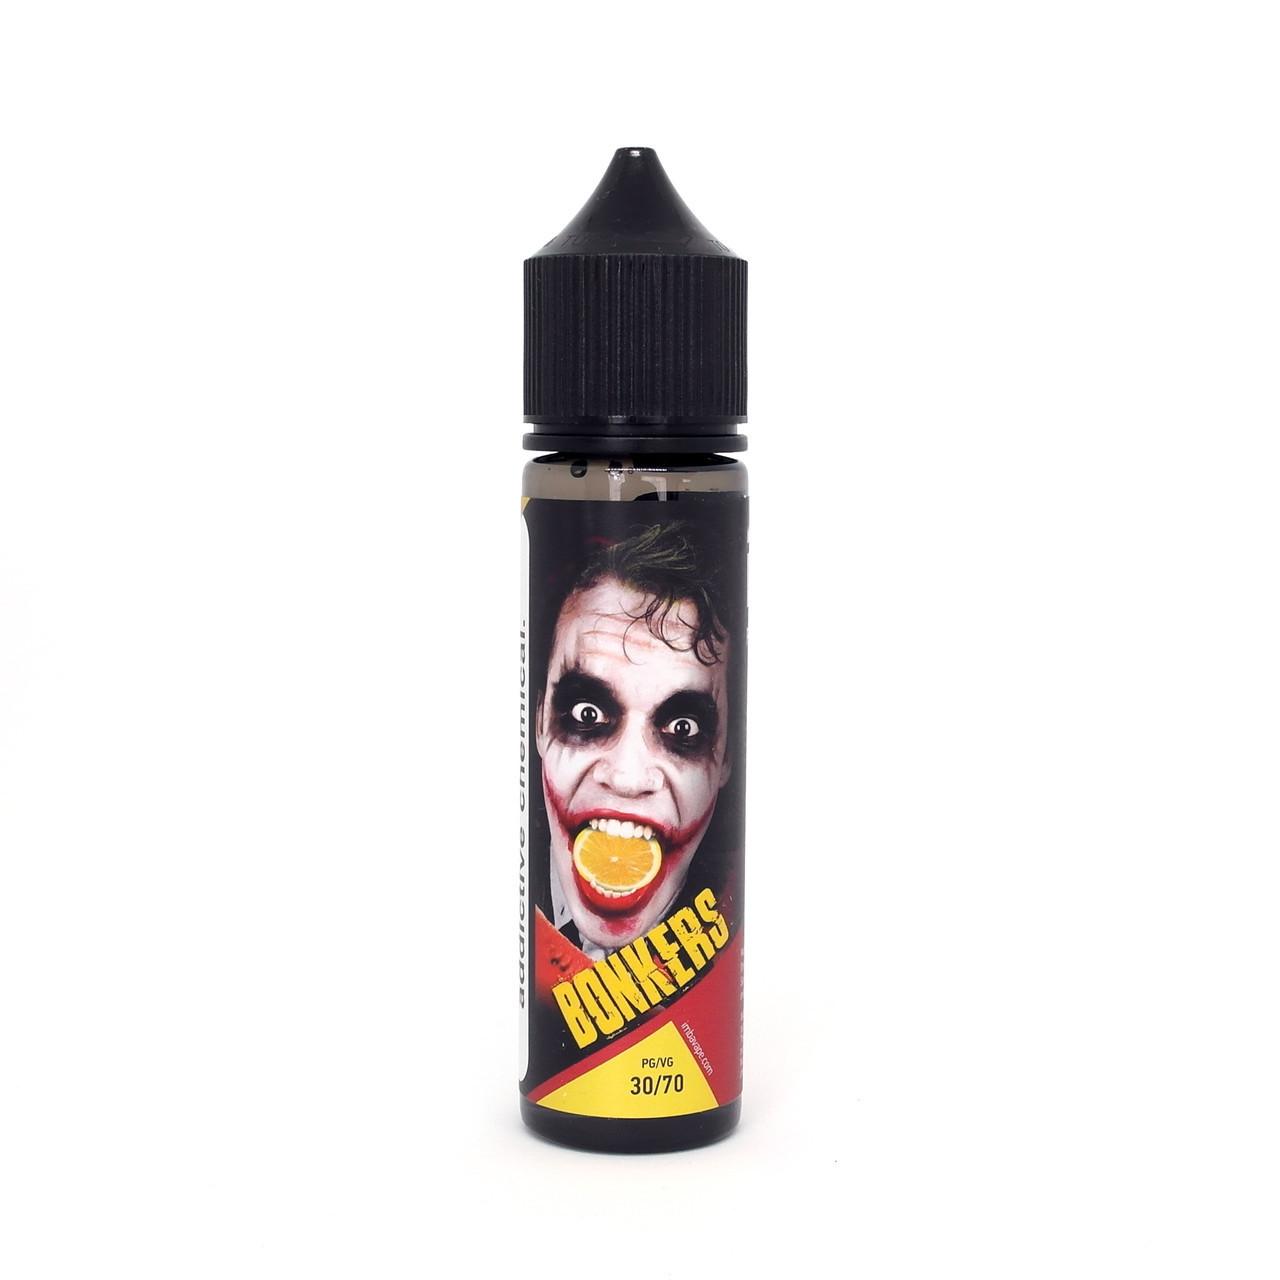 Жидкость для электронных сигарет Imba Bonkers 1.5 мг 60 мл